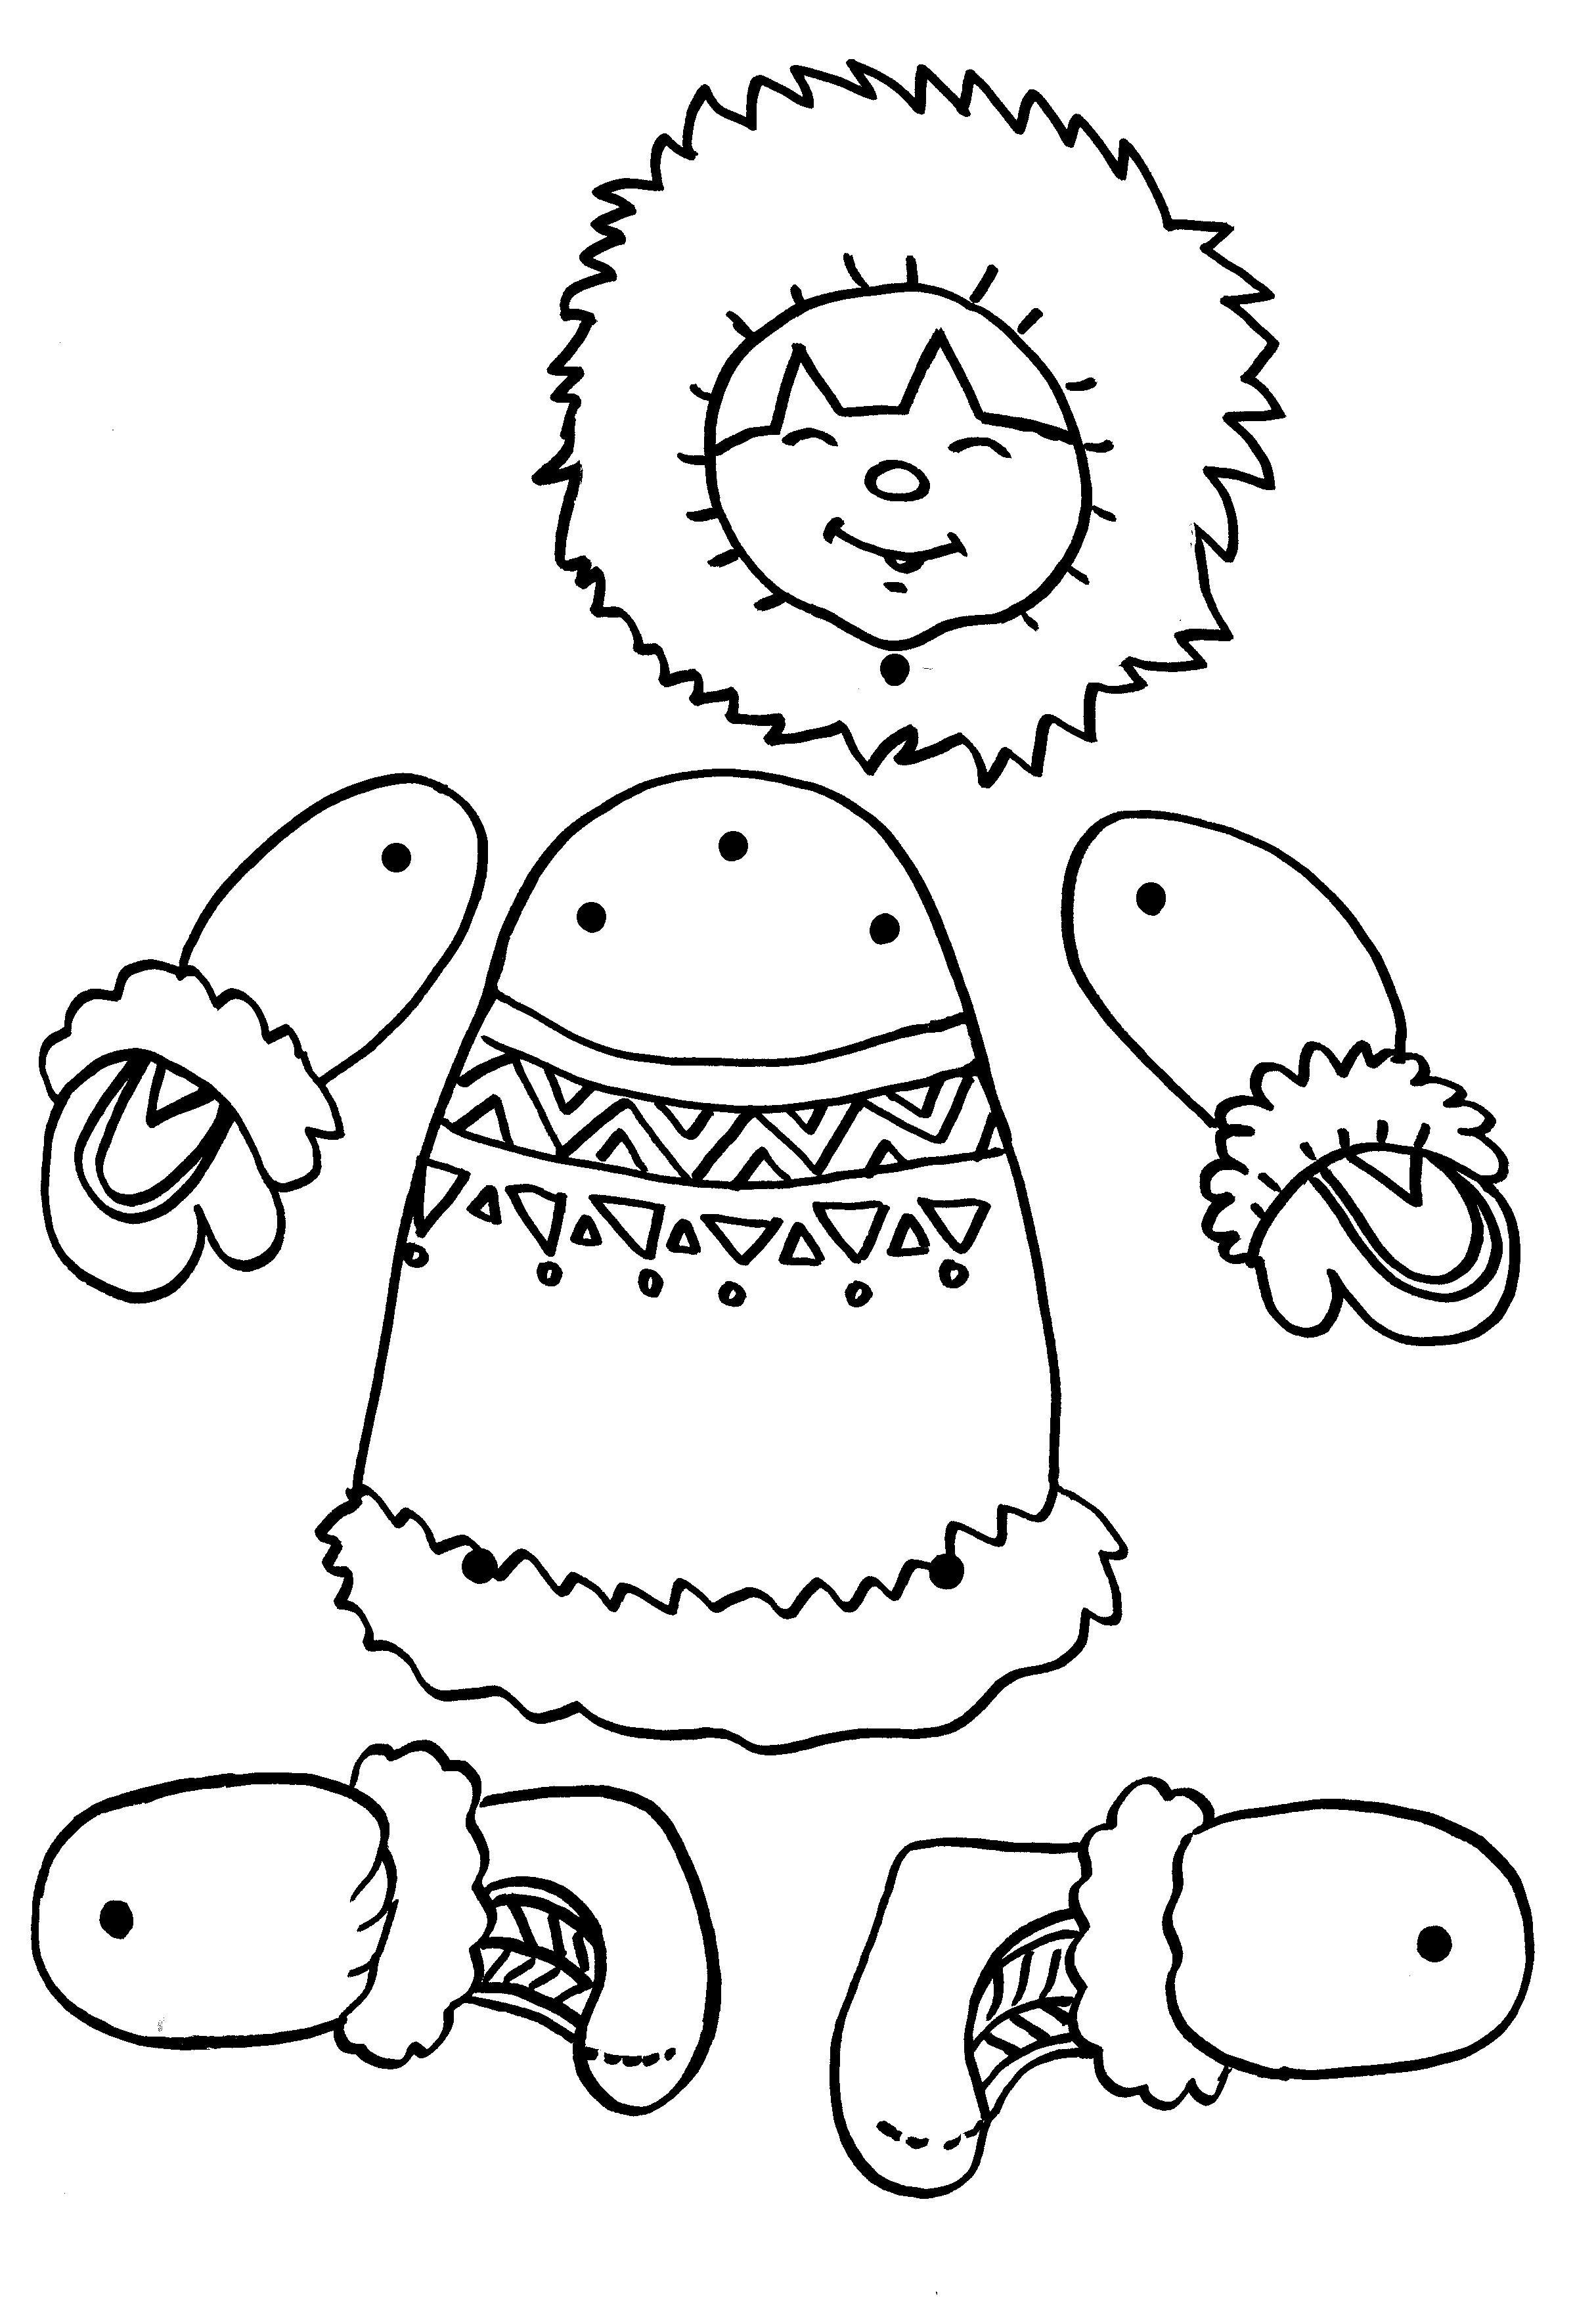 Activite monter un esquimau mobile avec des attaches - Esquimau dessin ...